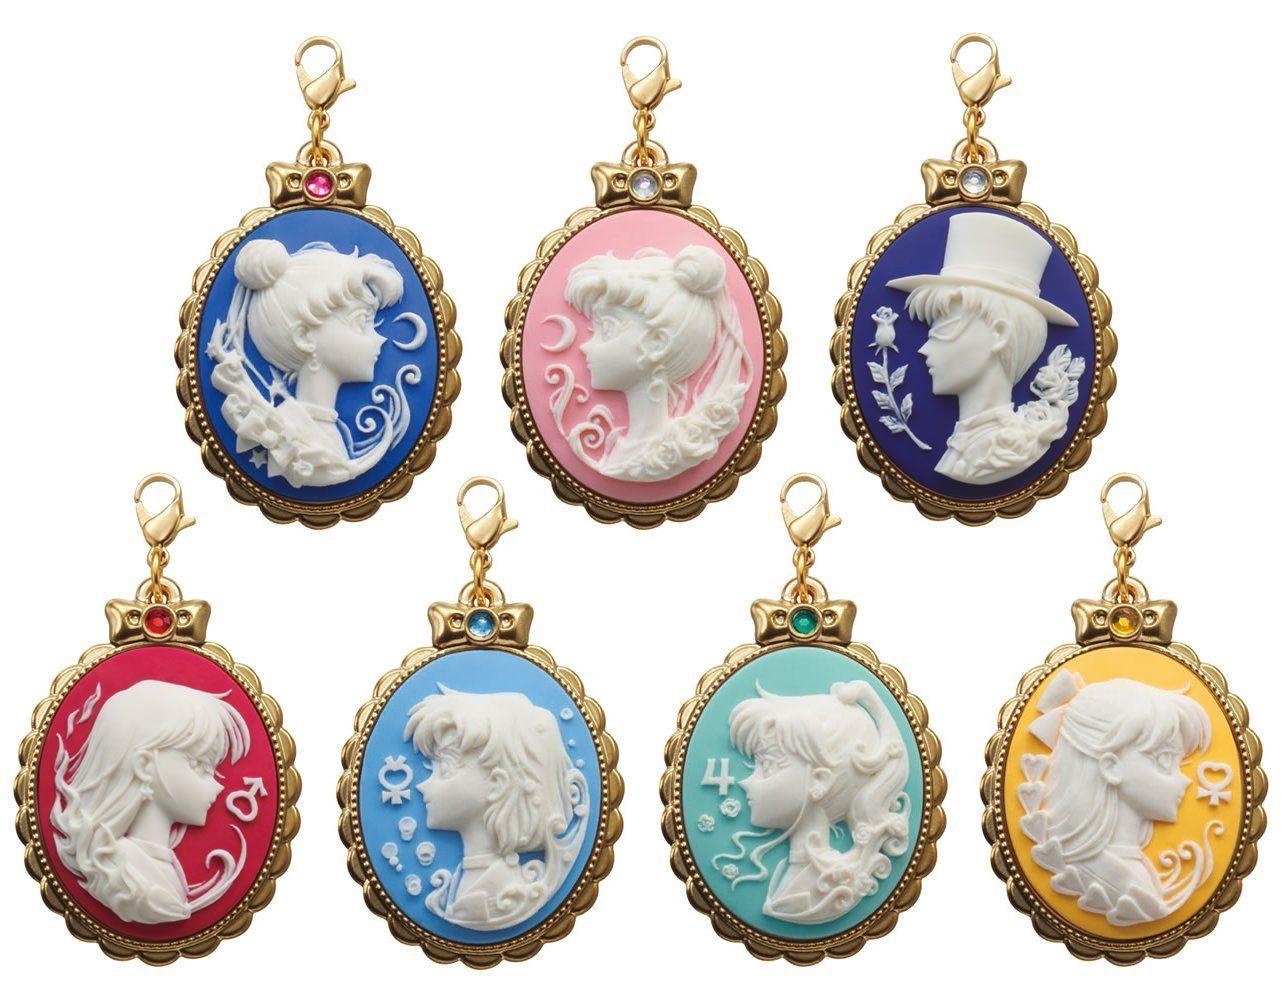 Pretty Soldier Sailor Moon Moon prism Mascot Charm Sailor Venus